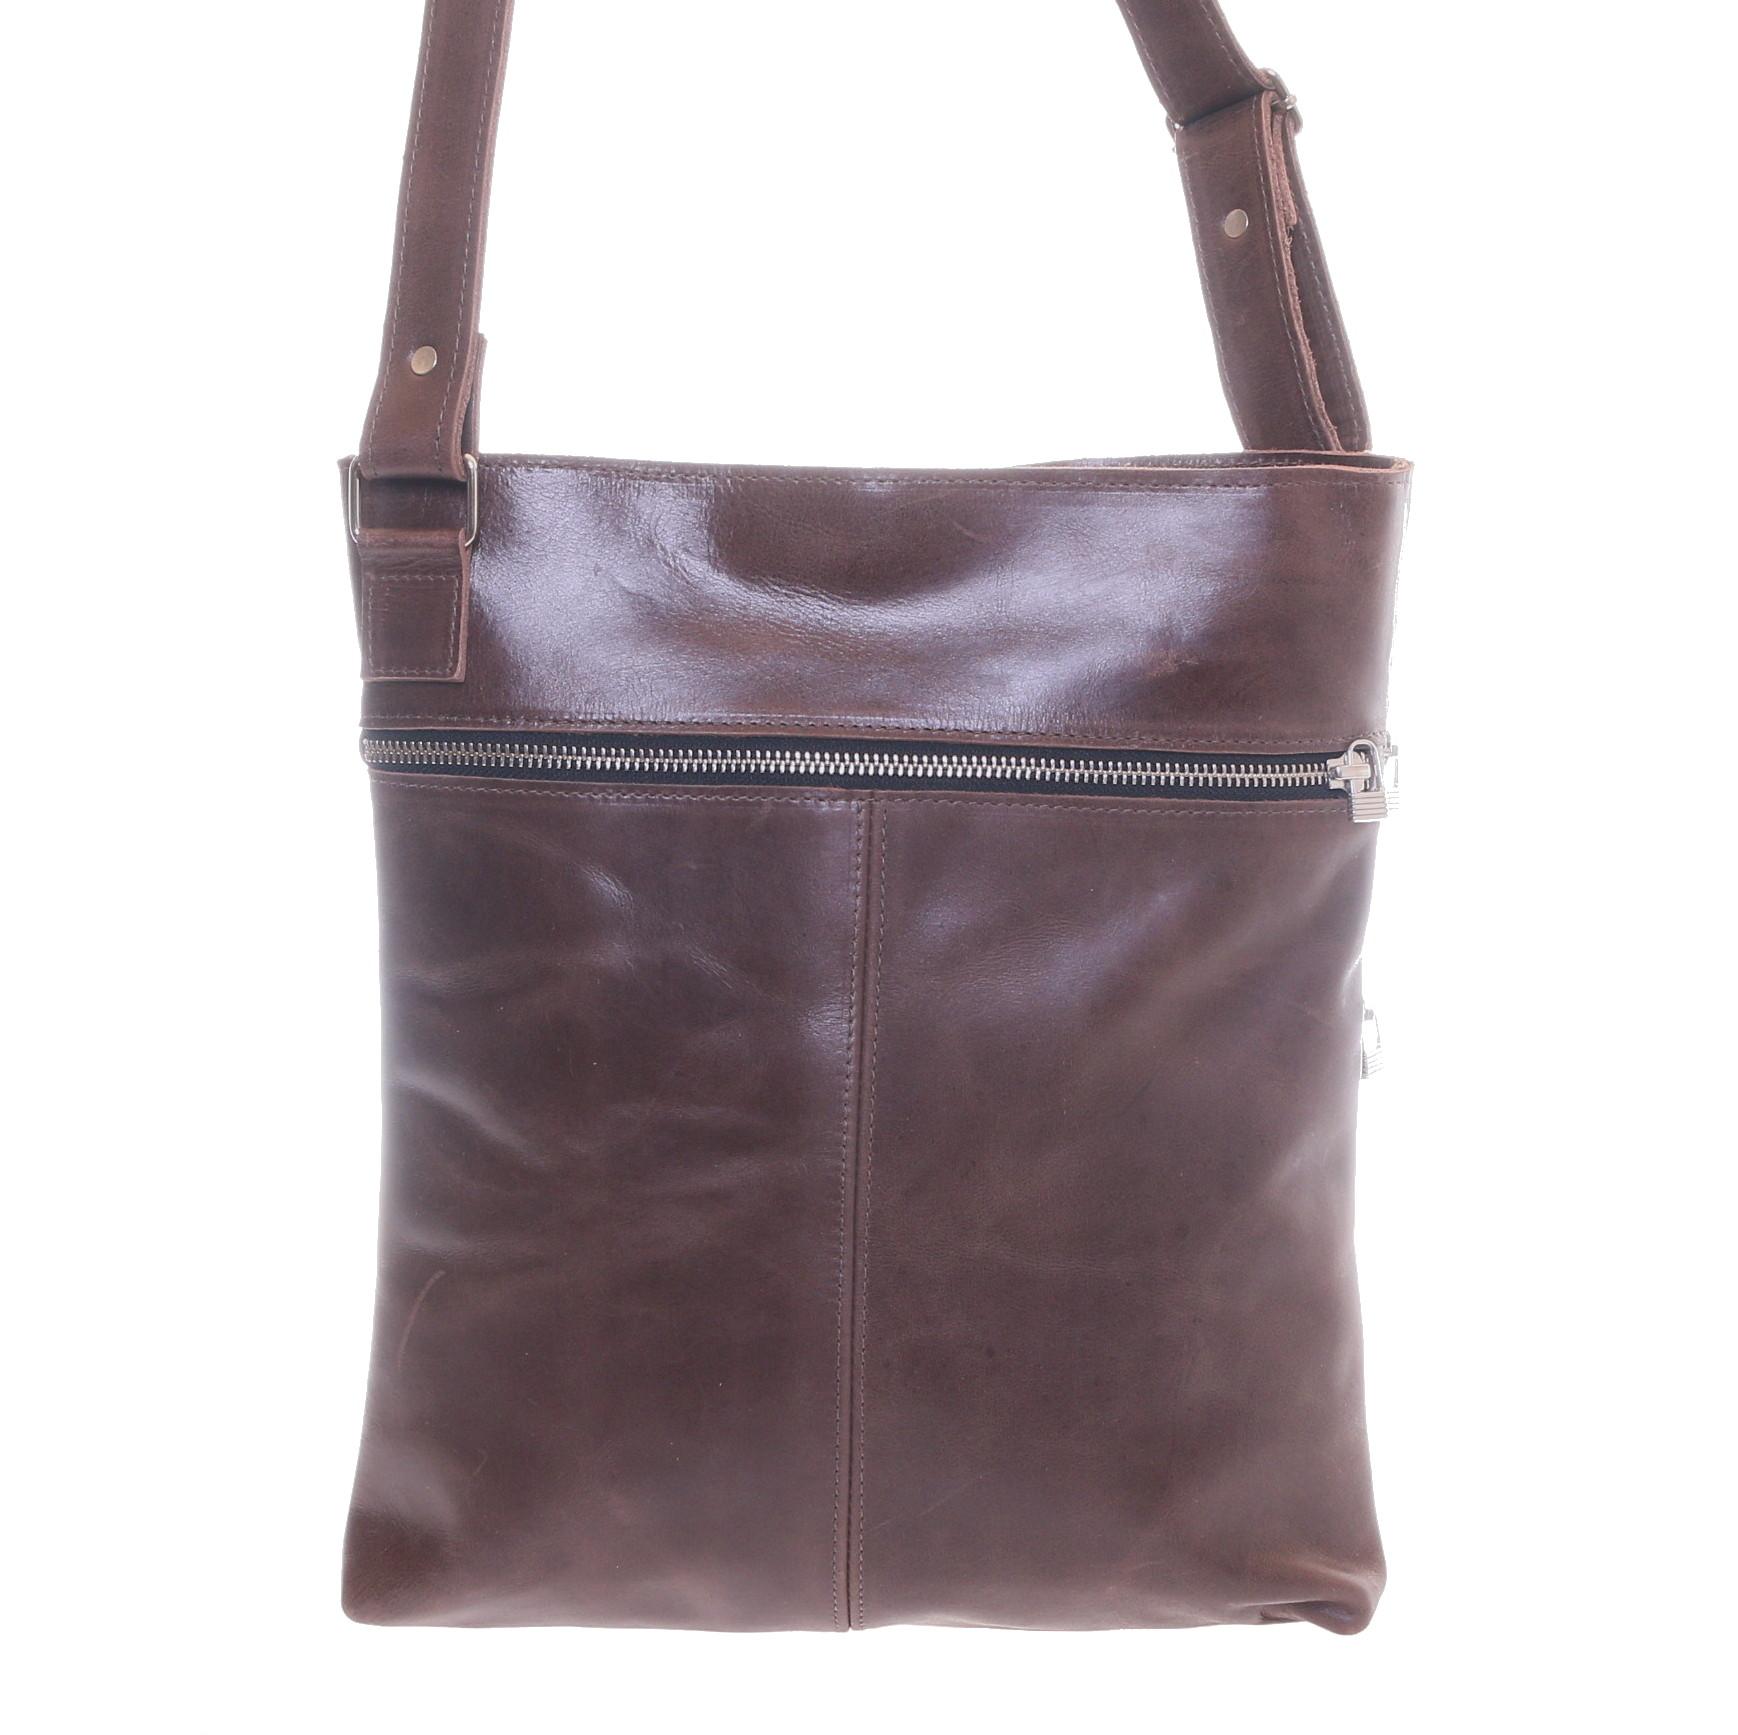 Gundara - fairtrade genuine cow leather bag - handmade in Ethiopia